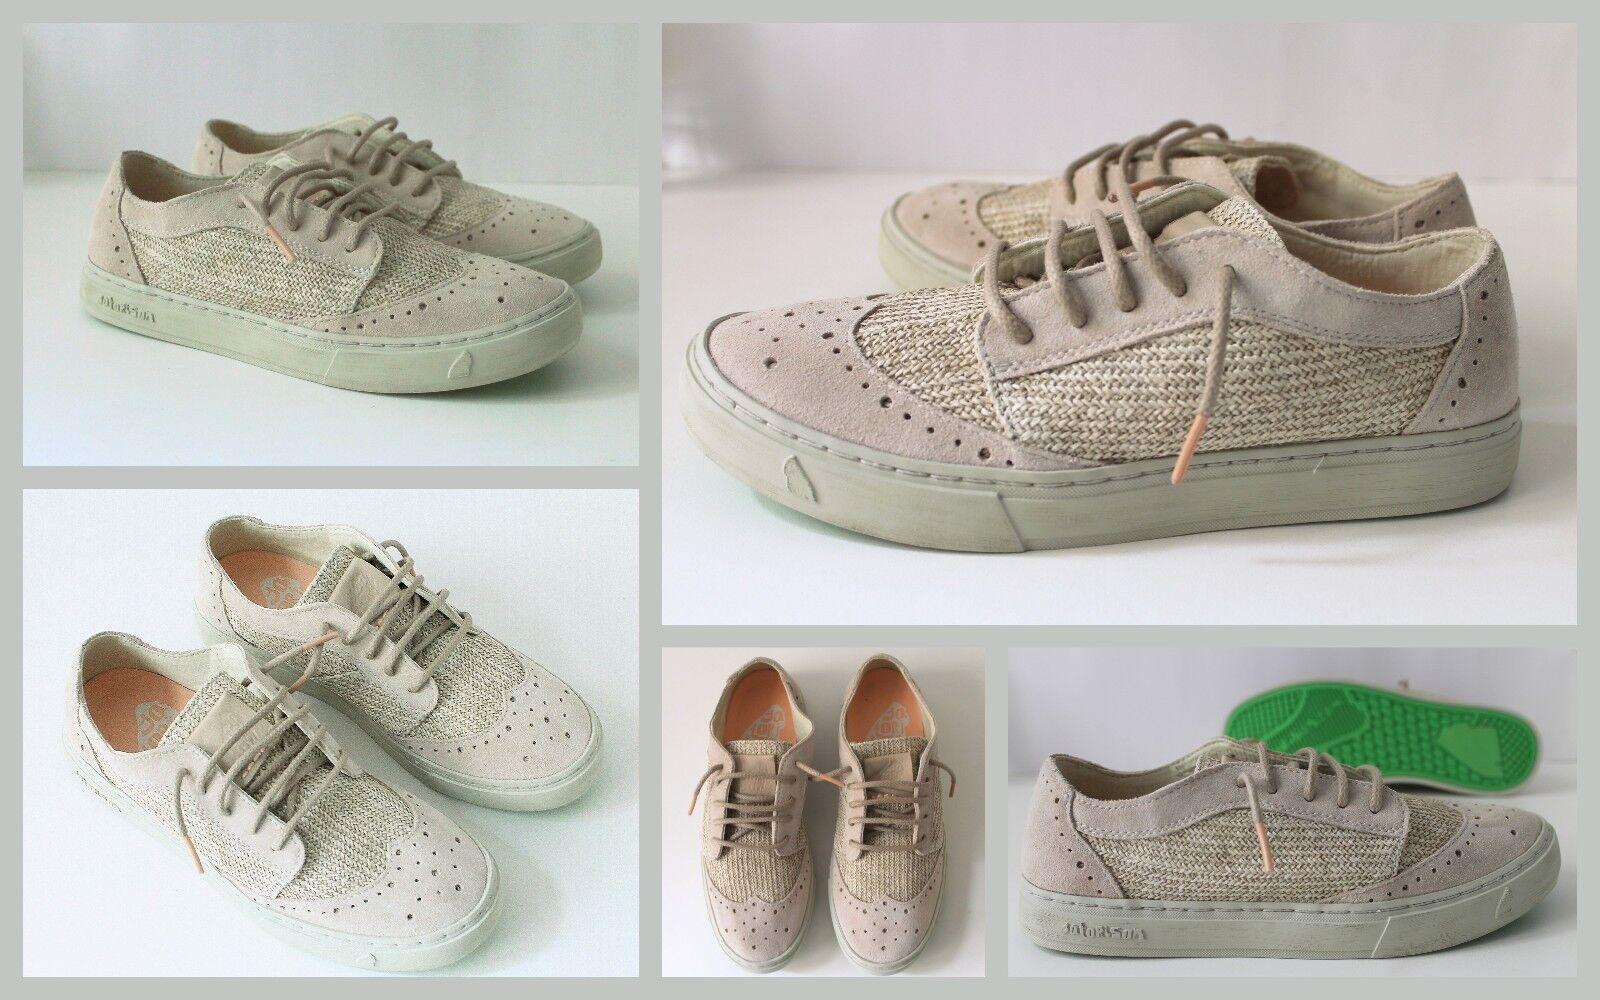 Scarpe casual da uomo  scarpe Satorisan Yukai Suede-mall Mega Marbre dal 36 al 45